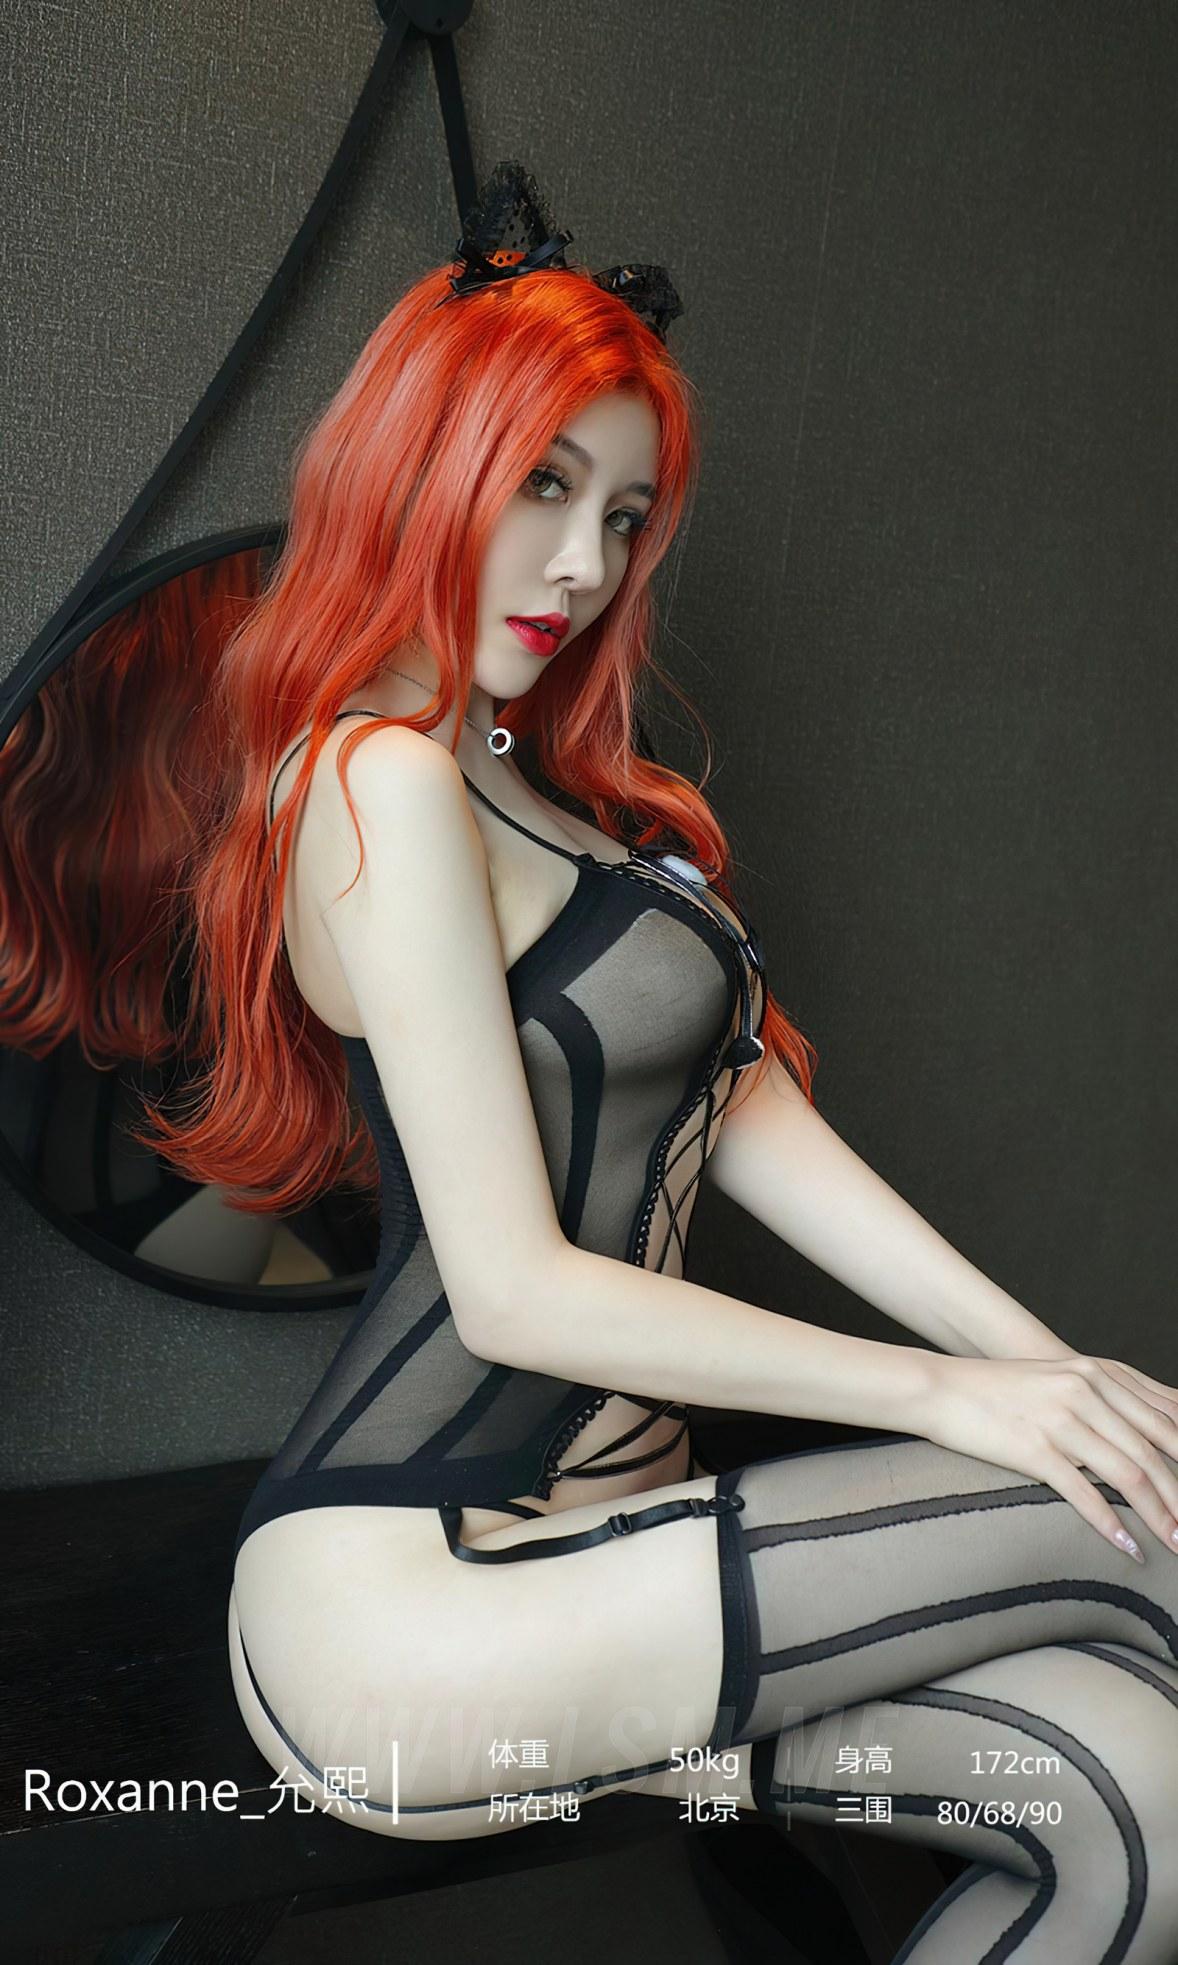 UGirls 爱尤物 No.2073 允熙 红皇后 - 3